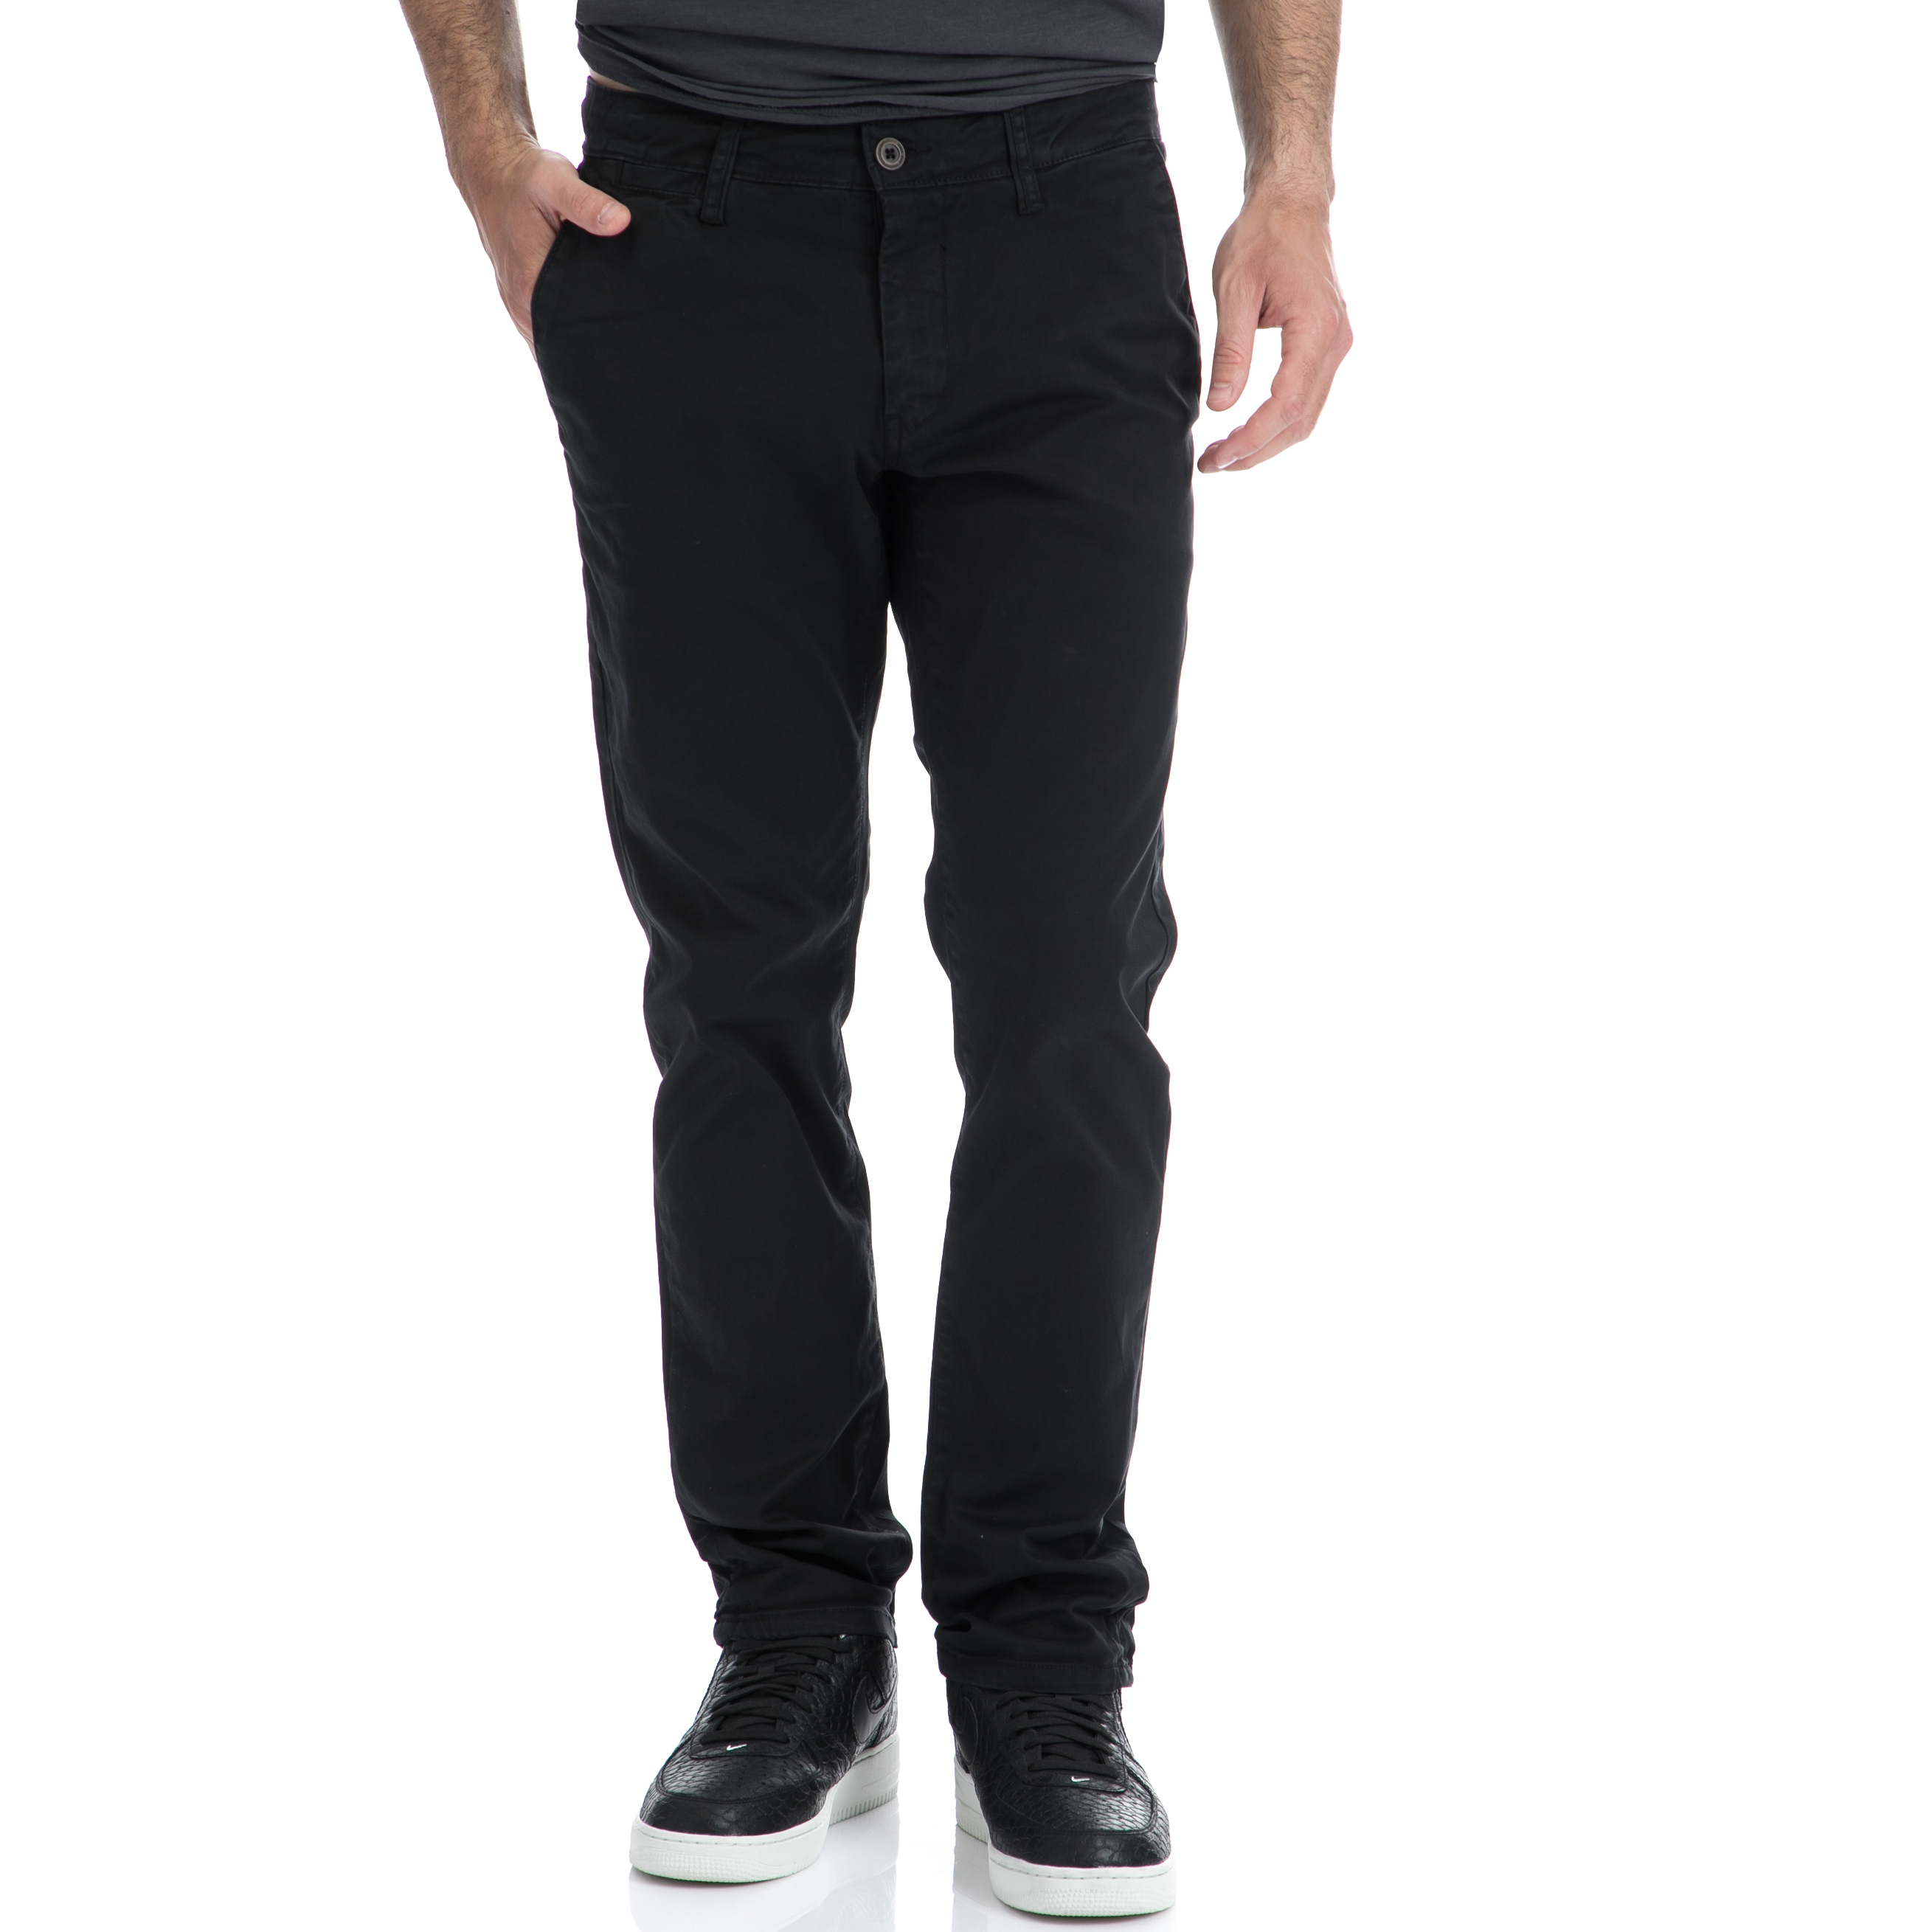 GARCIA JEANS - Αντρικό παντελόνι Garcia Jeans μαύρο ανδρικά ρούχα παντελόνια chinos